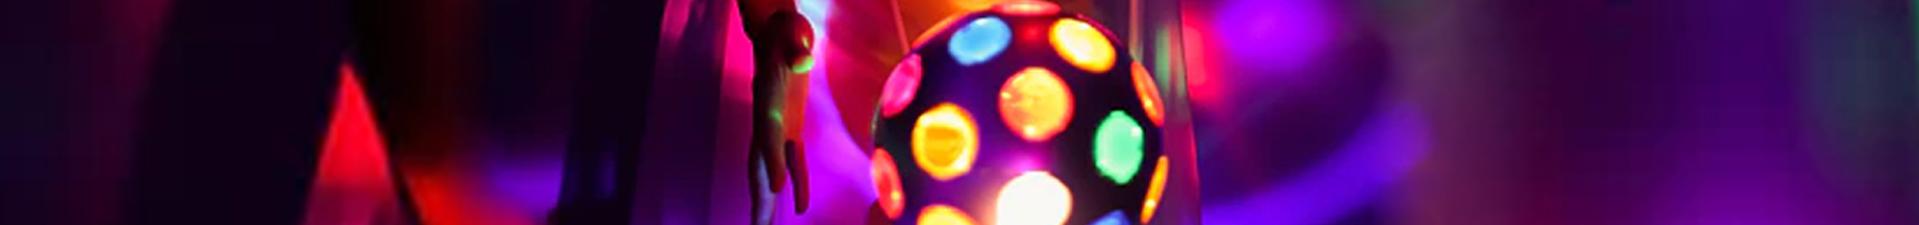 Iluminação Fun